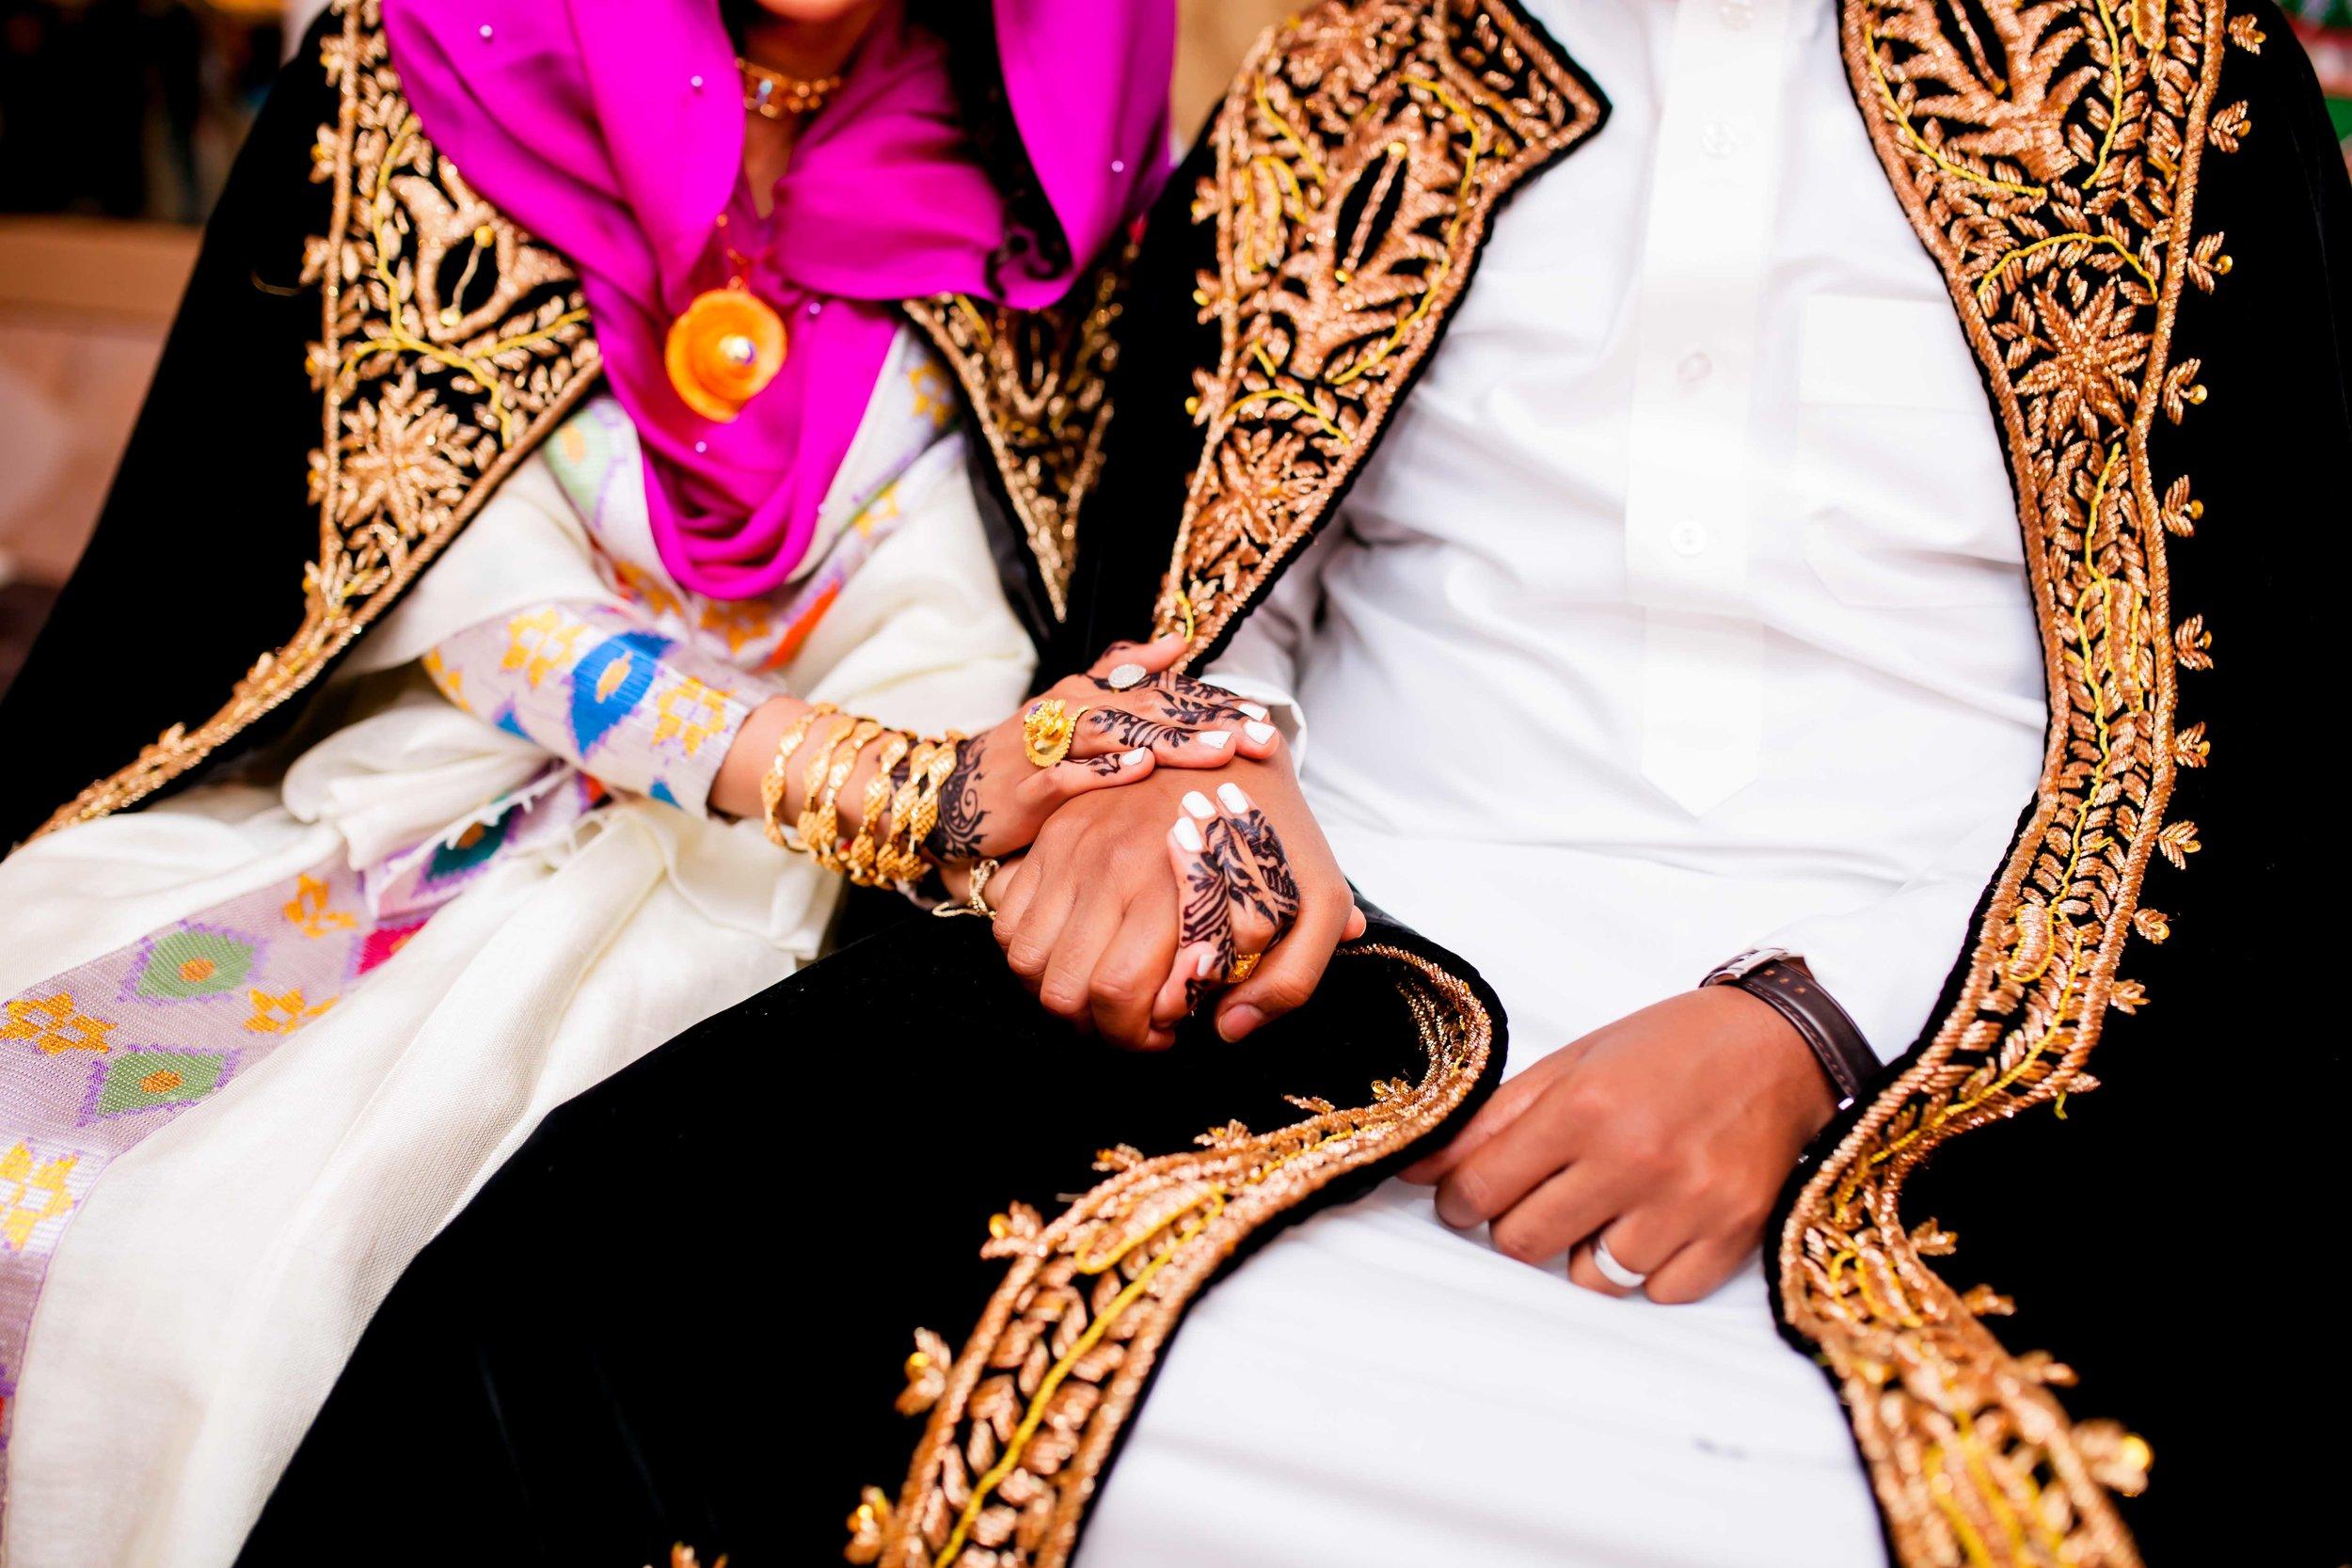 Wedding Details Red Eritrean Habesha Arab Wedding Toronto Scarborough Convention Centre Blog Markham Rami Decor Grand Stage Ethiopian Canada Ontario Photographer Karimah Gheddai Melse Werki Jewllery